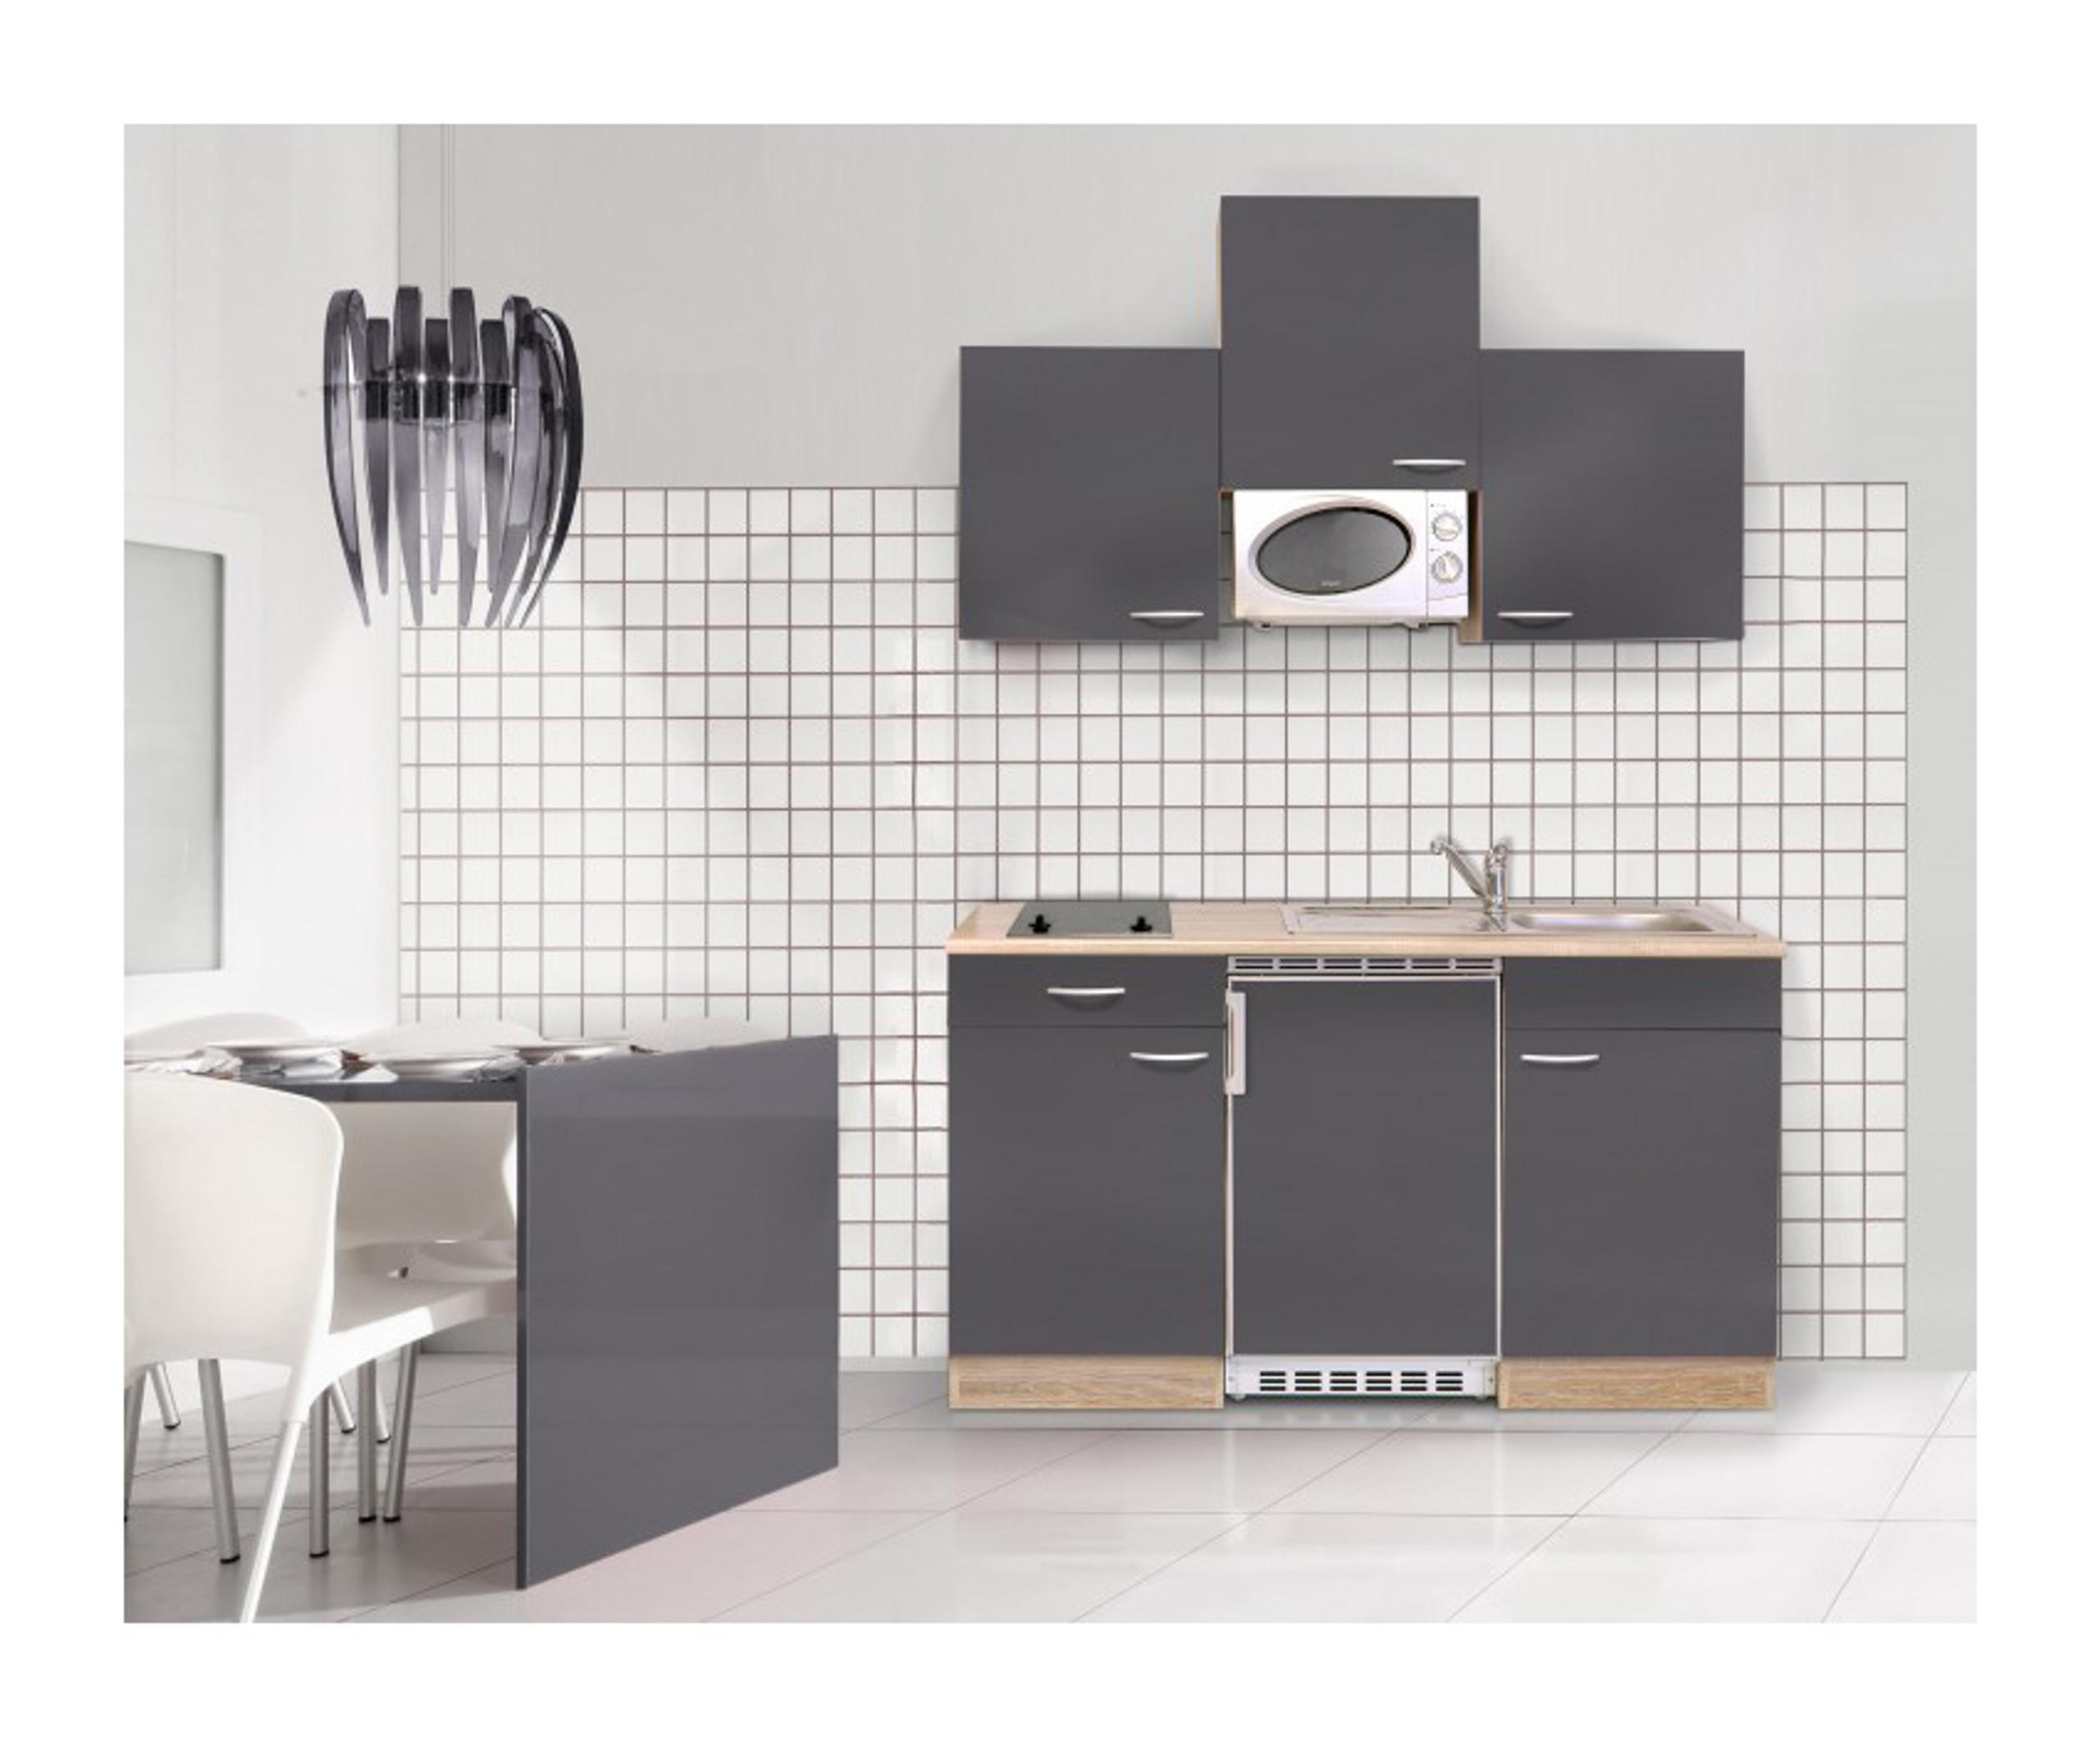 Miniküche Mit Kühlschrank 130 Cm : Mebasa singleküche cm grau hochglanz ceranfeld mikrowelle